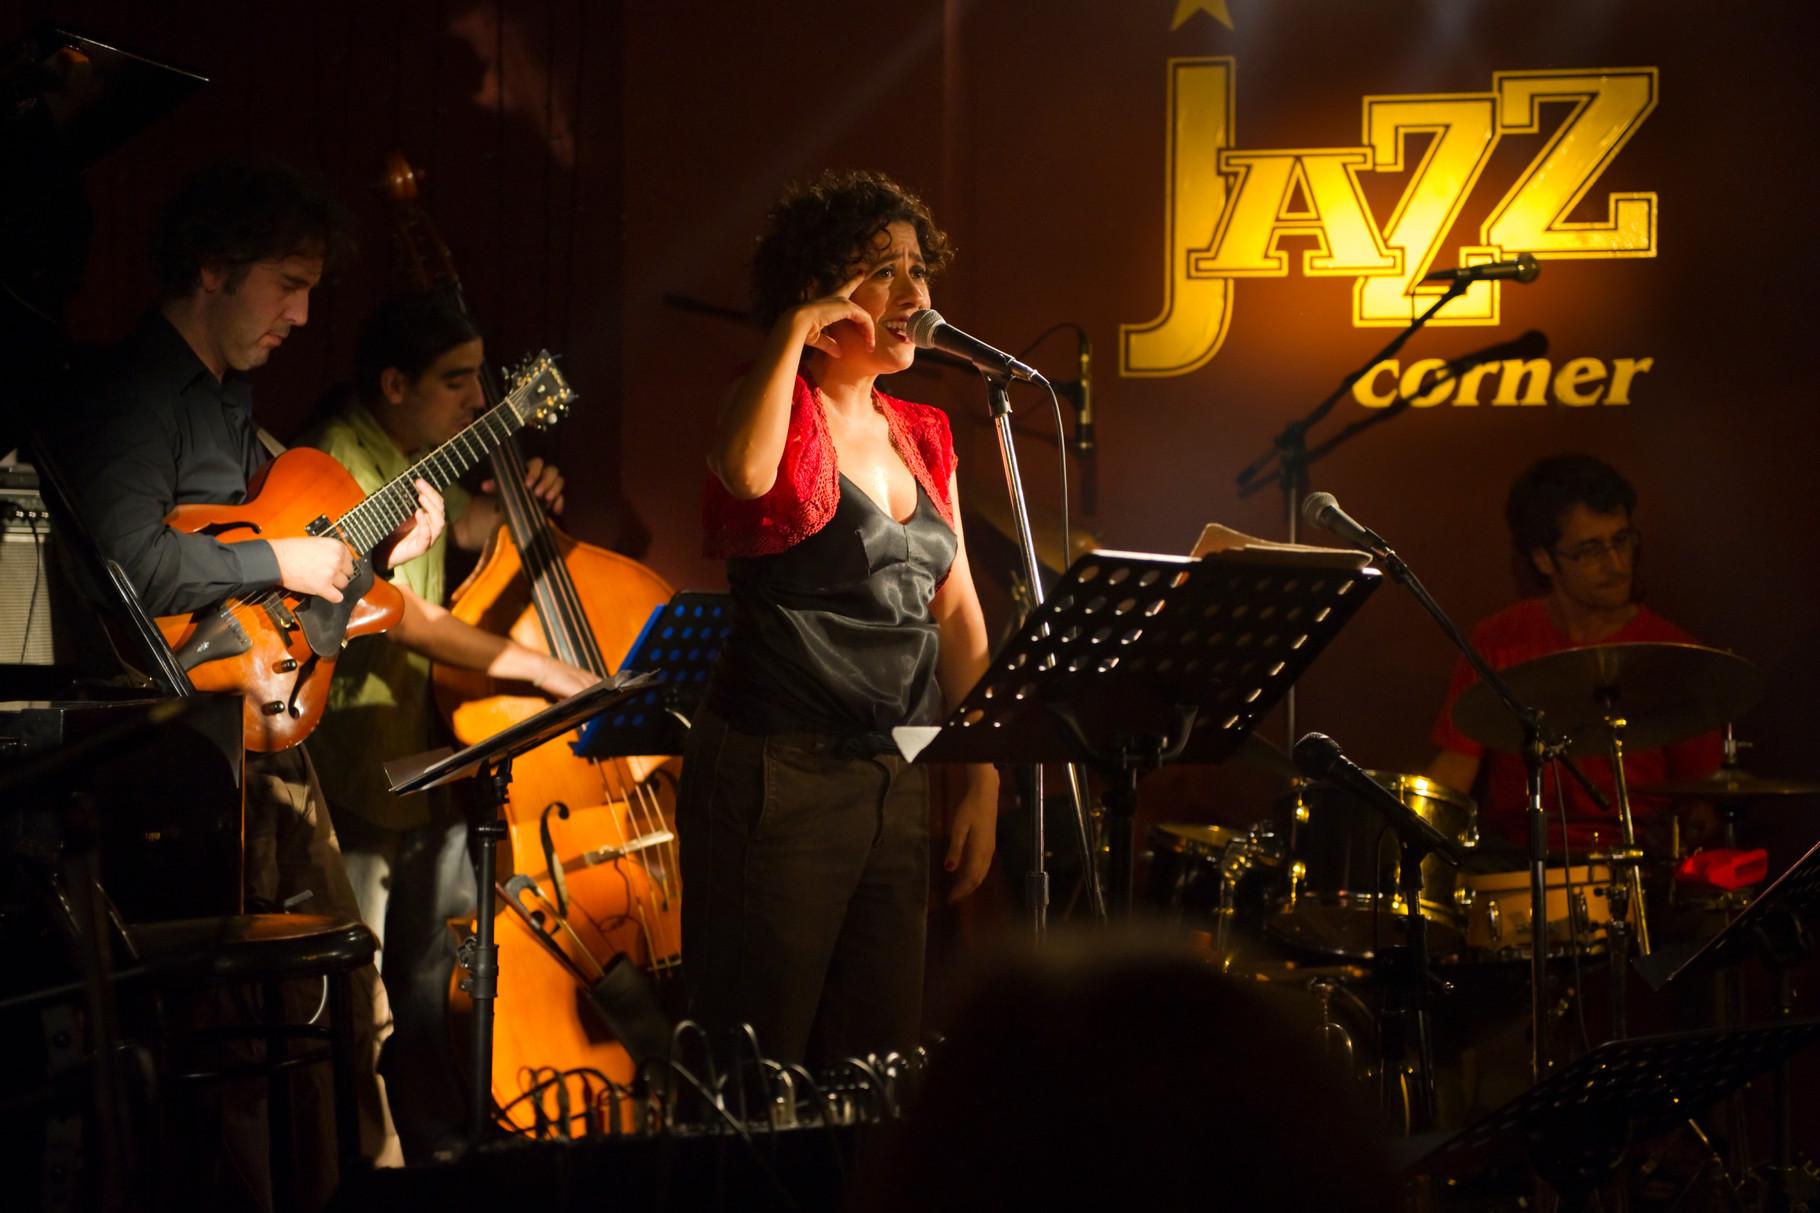 QUINTETO. JAZZ CORNER, SEVILLA. NOVIEMBRE 2010 (fotos: Jose Luca de Tena)